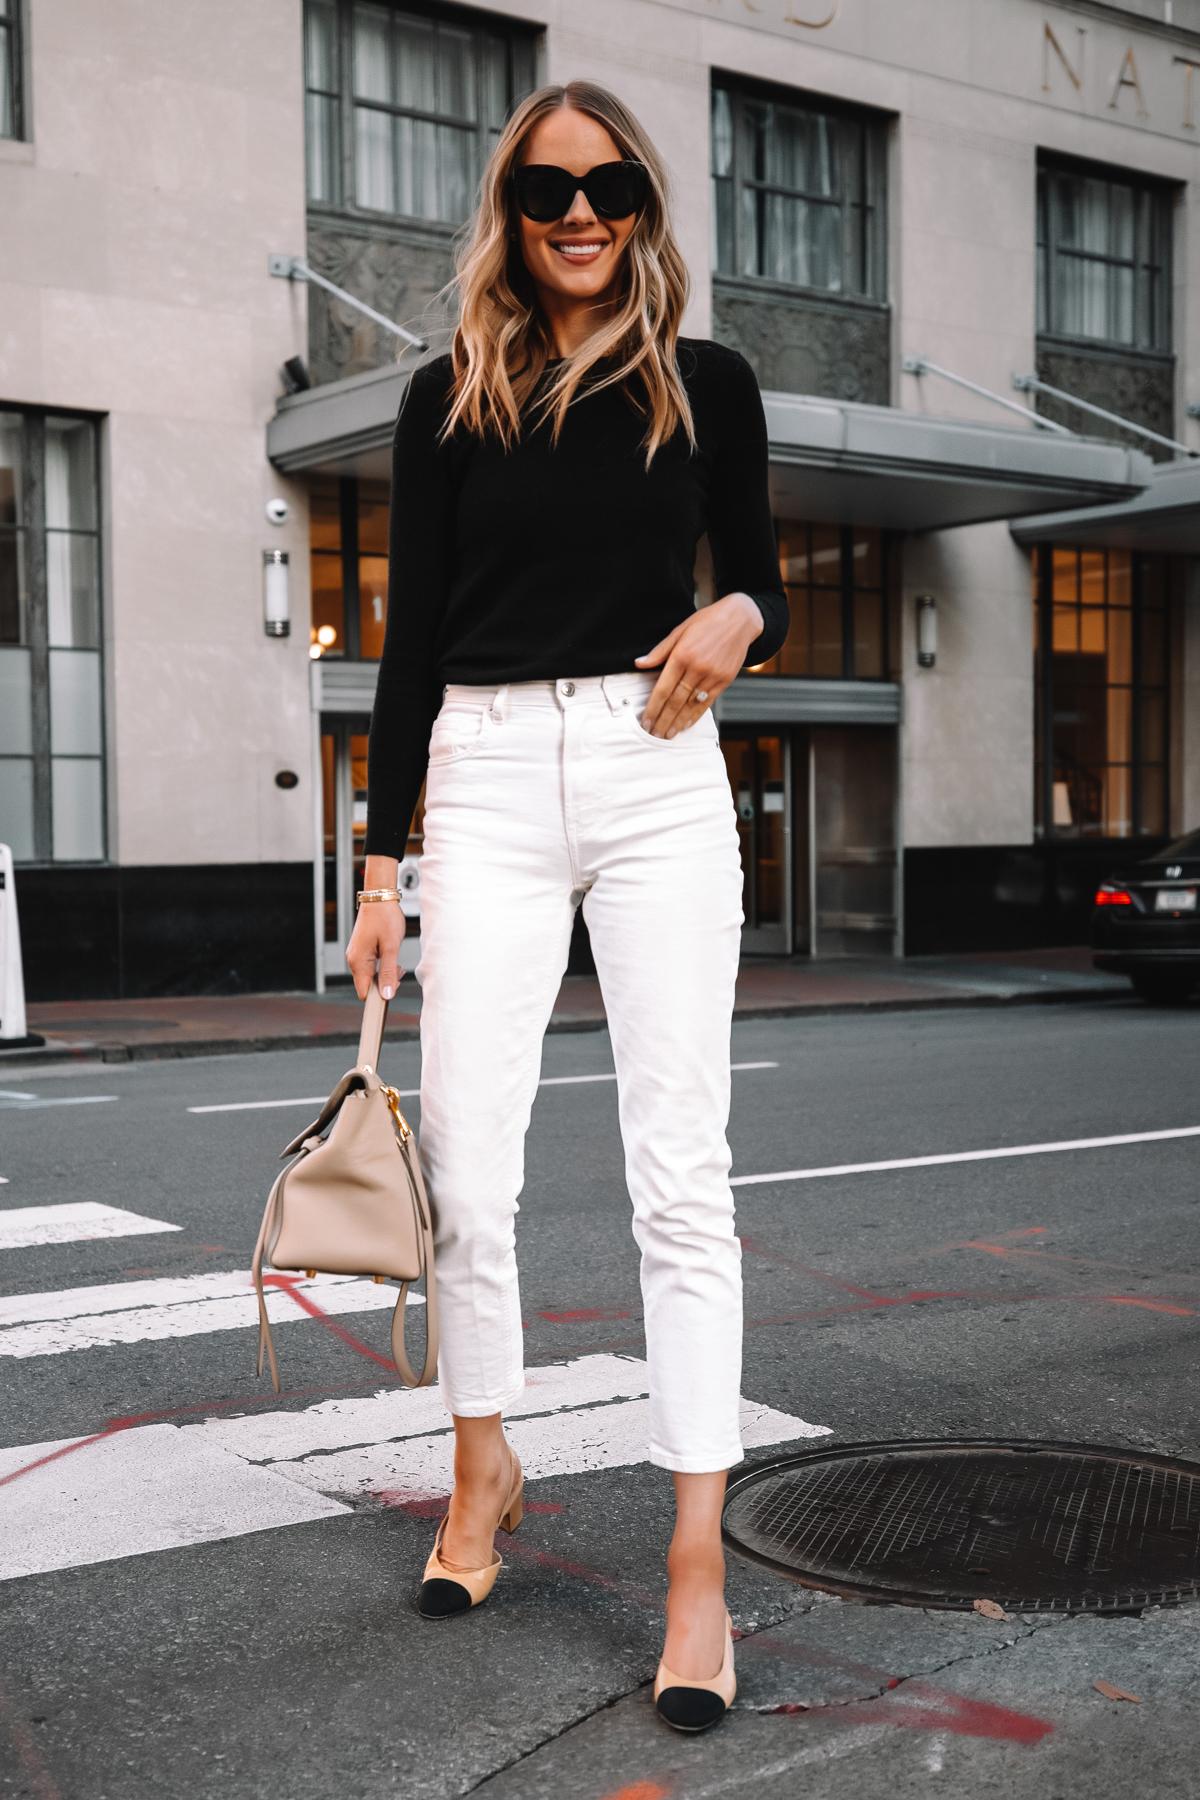 Fashion Jackson Wearing Everlane Black Cashmere Sweater Everlane White Jeans Chanel Slingbacks Celine Belt Bag Street Style 2